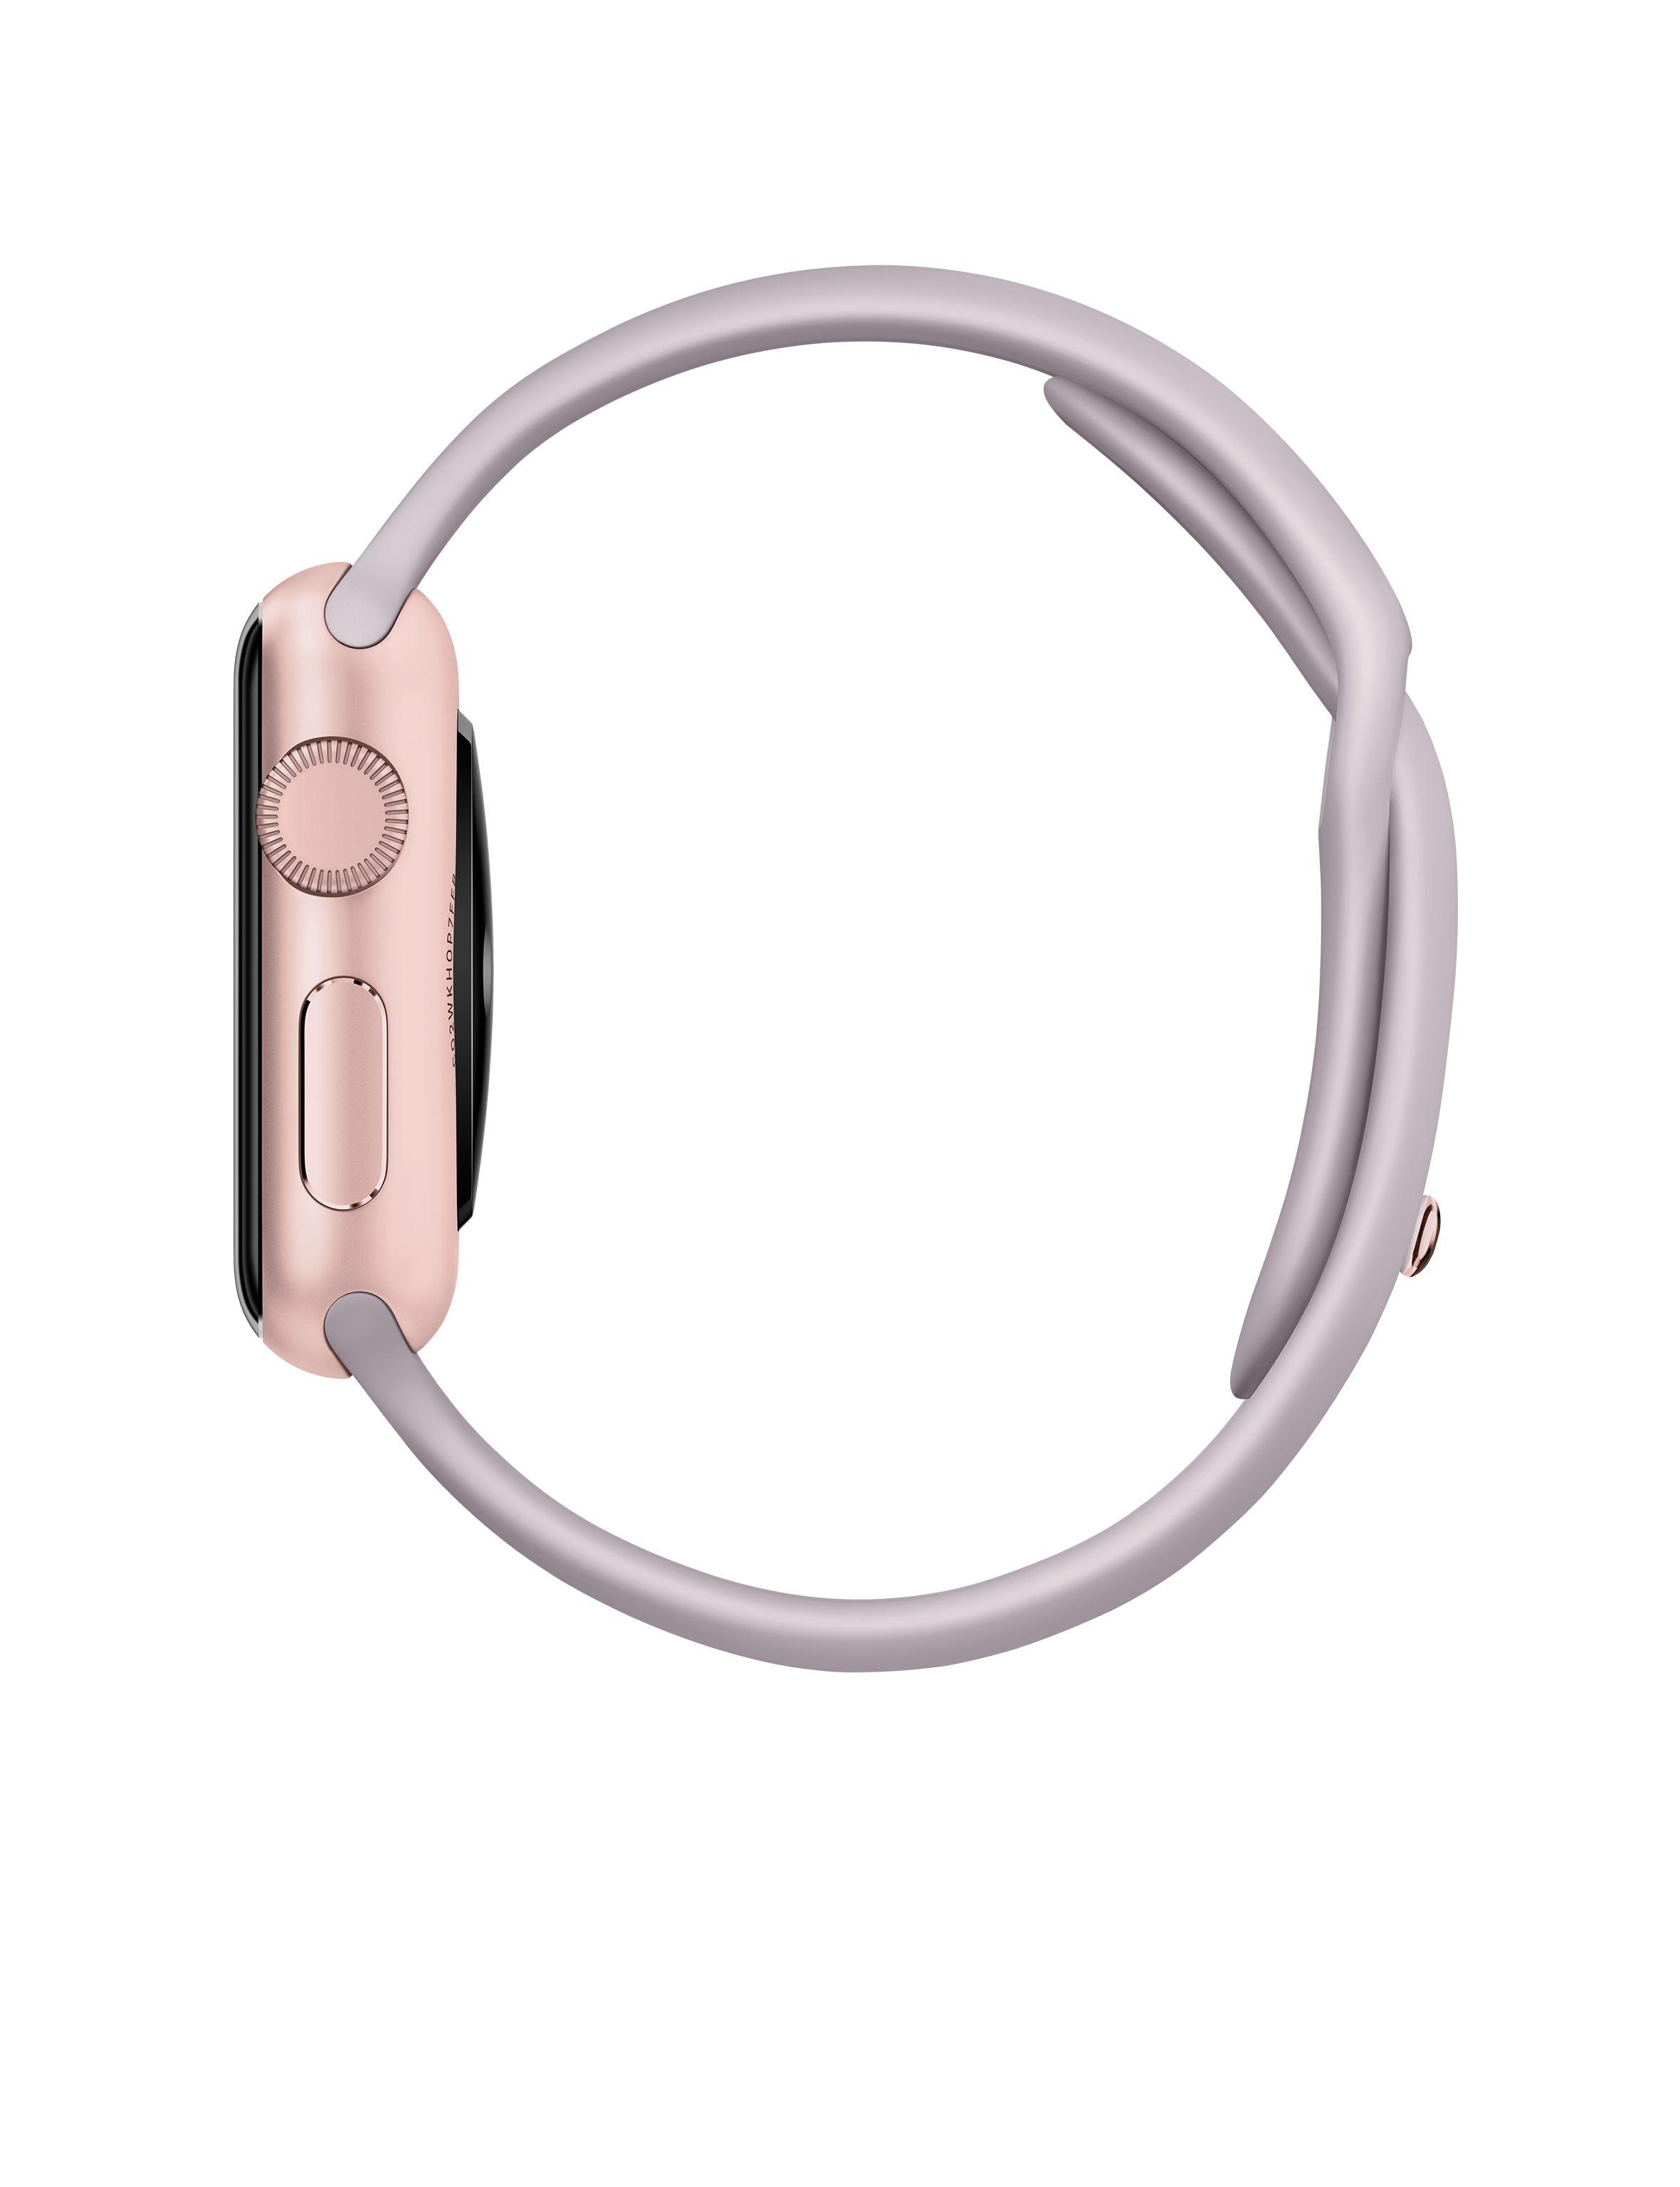 Apple Watch Edition комплект